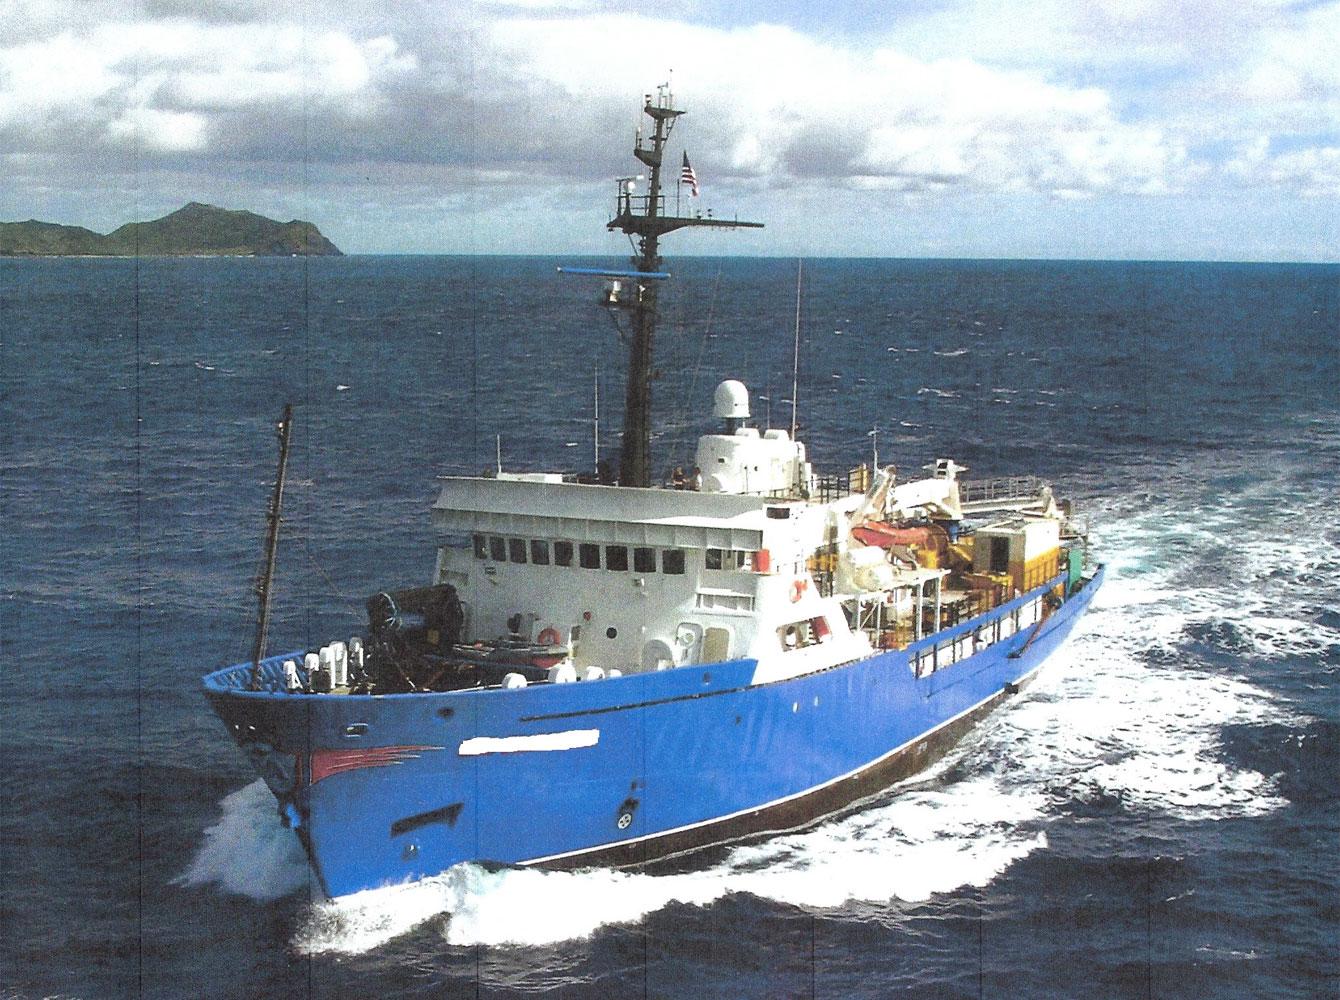 R-100: 231' Research Vessel